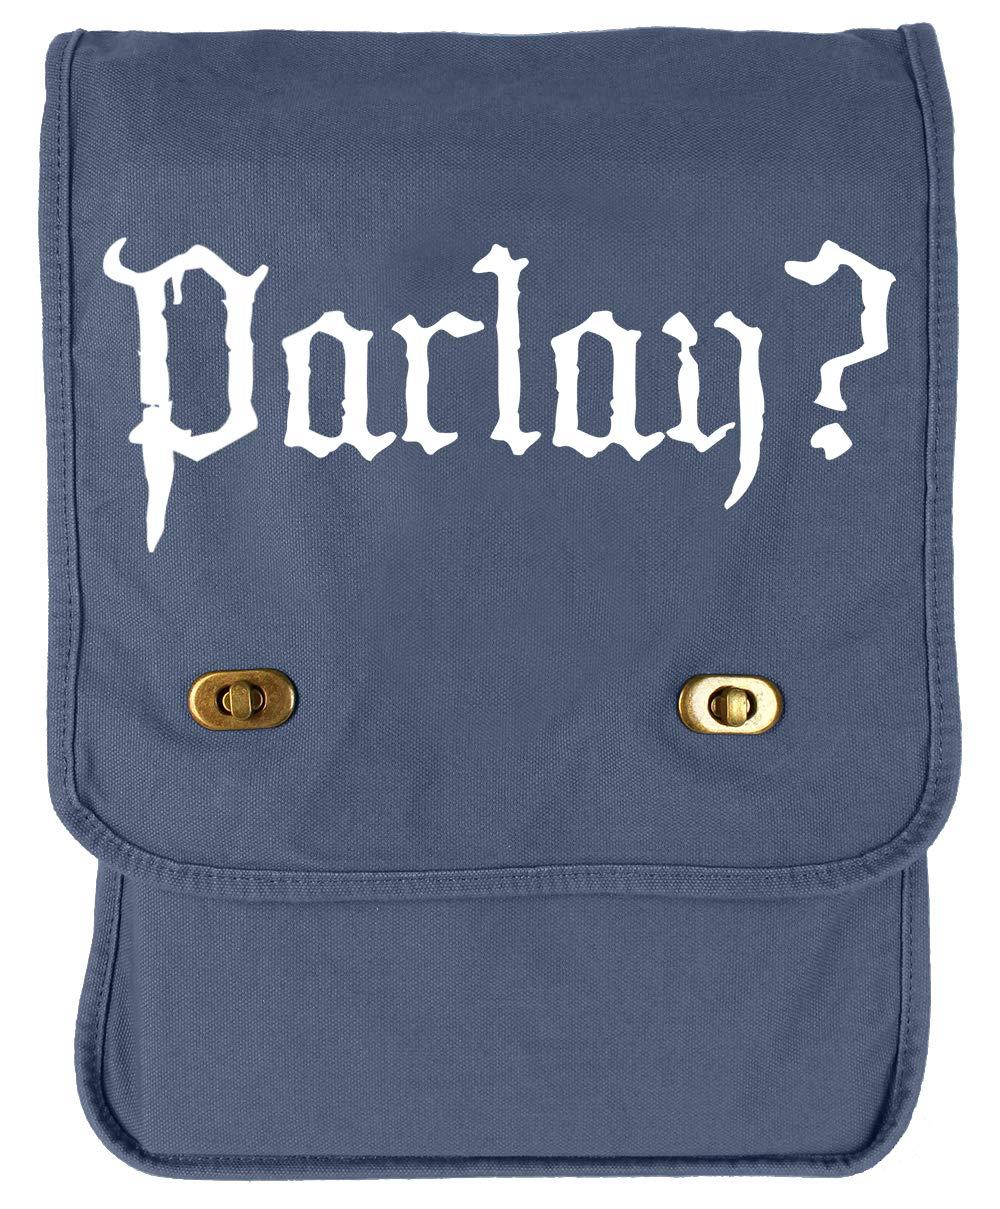 Tenacitee Parlay Flamingo Raw Edge Canvas Messenger Bag